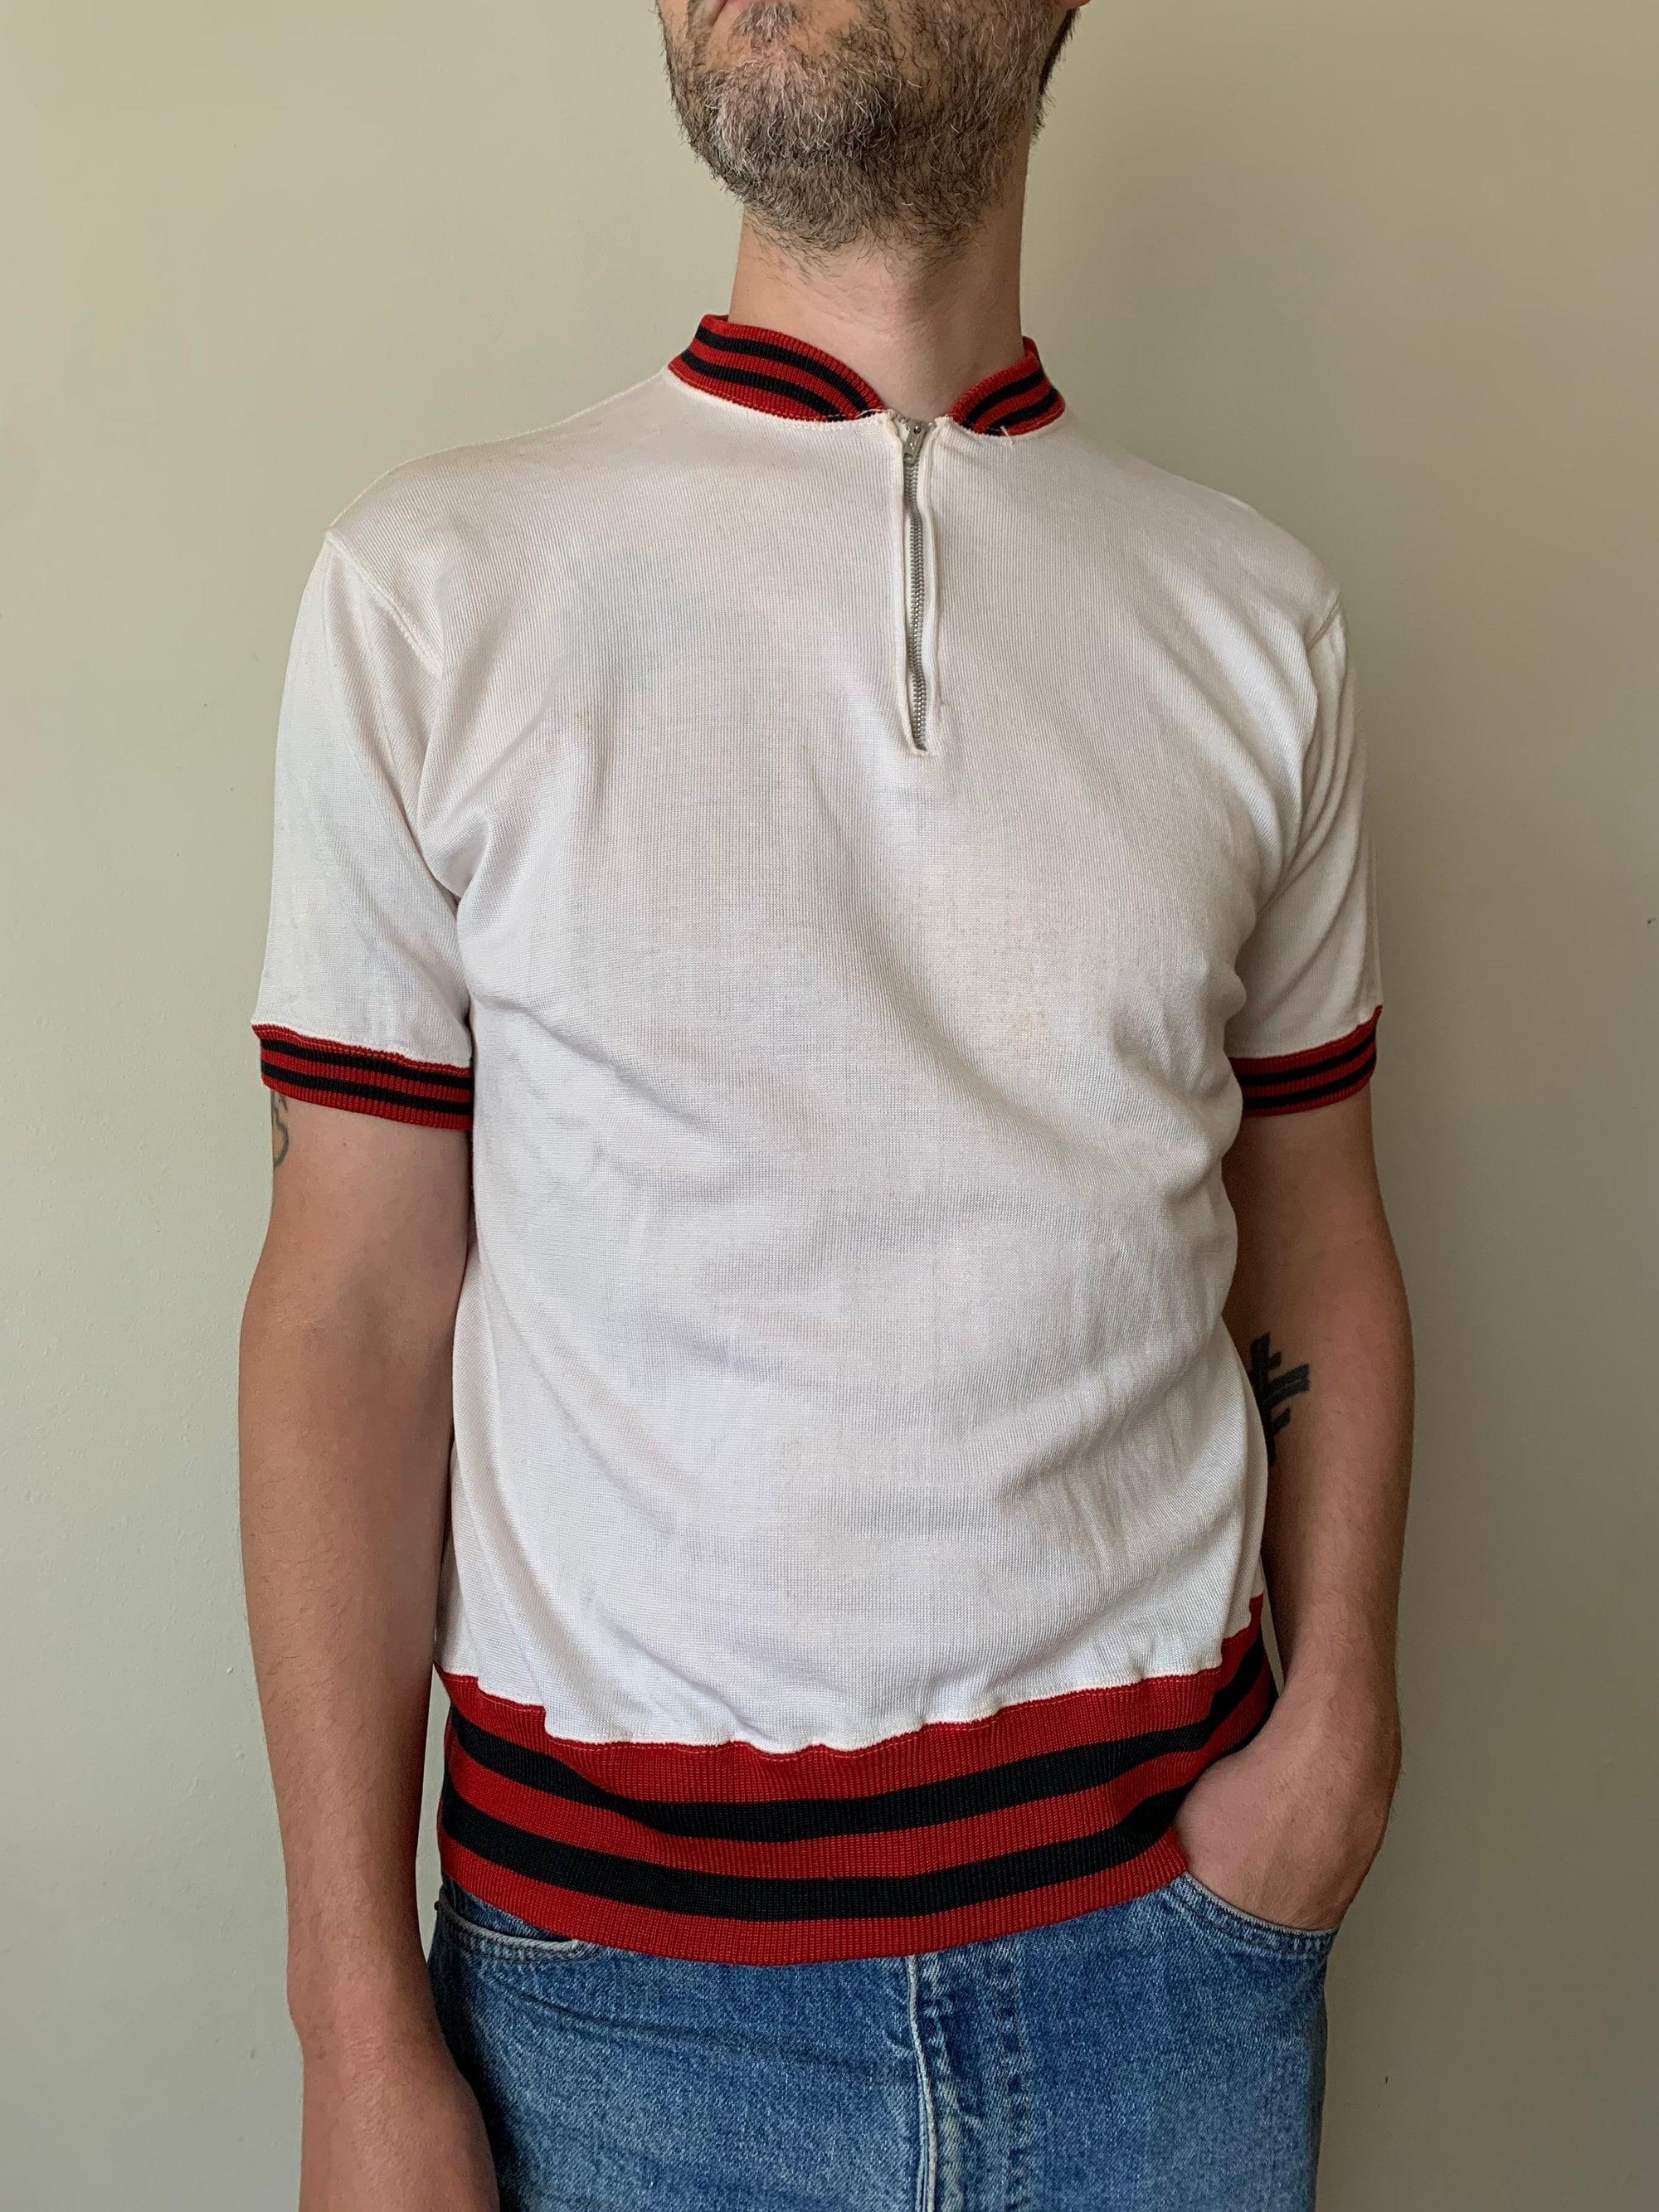 1950s Men's Ties, Bow Ties – Vintage, Skinny, Knit 1950S White Quarter Zip Durene TopVintage Athletic Mid-Century Jersey Team School Medium $75.00 AT vintagedancer.com